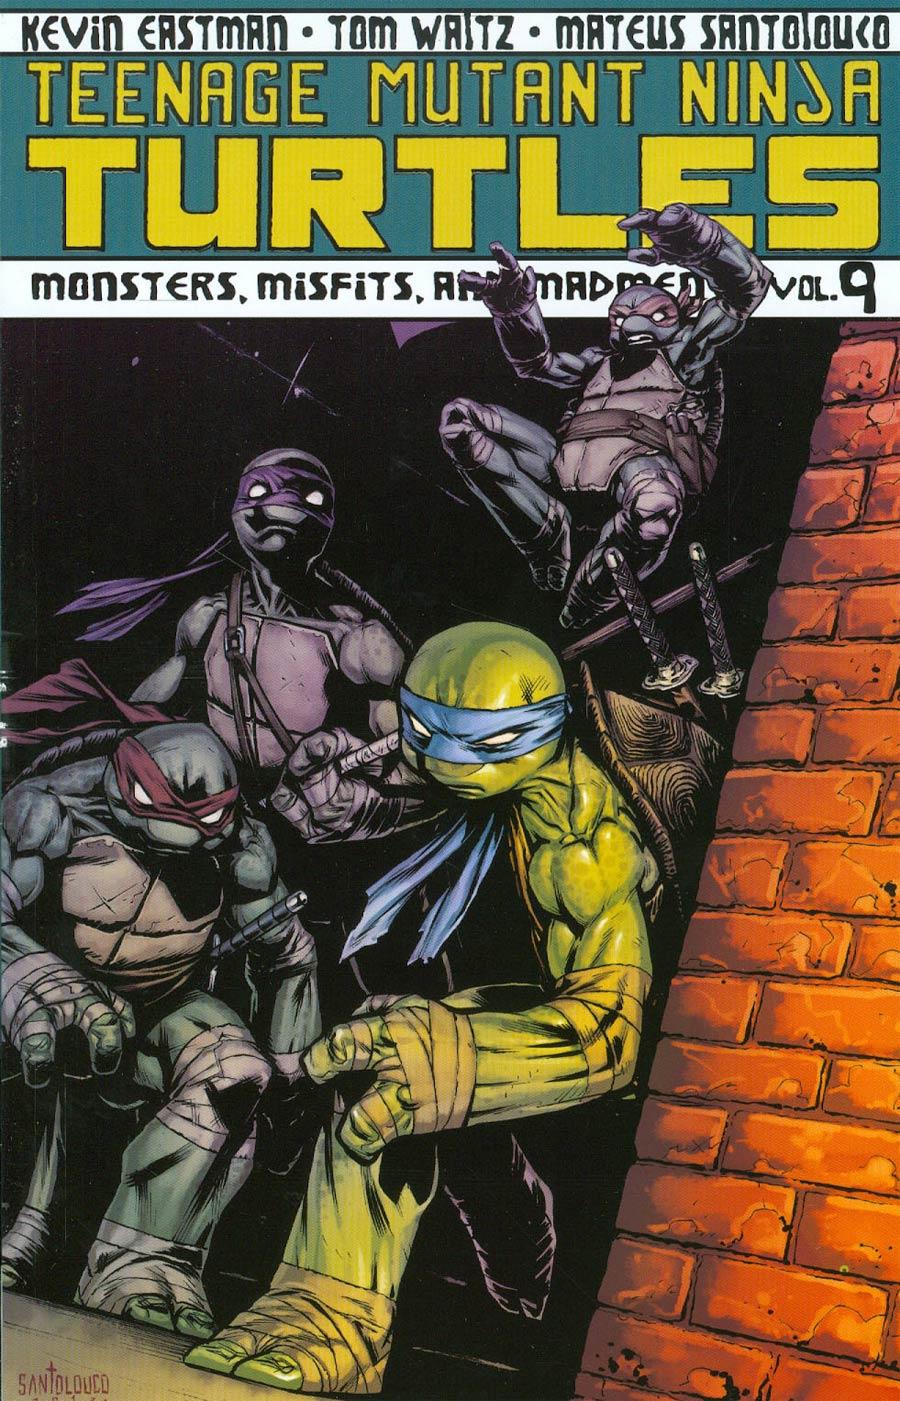 Teenage Mutant Ninja Turtles Ongoing Vol 9 Monsters Misfits And Madmen TP